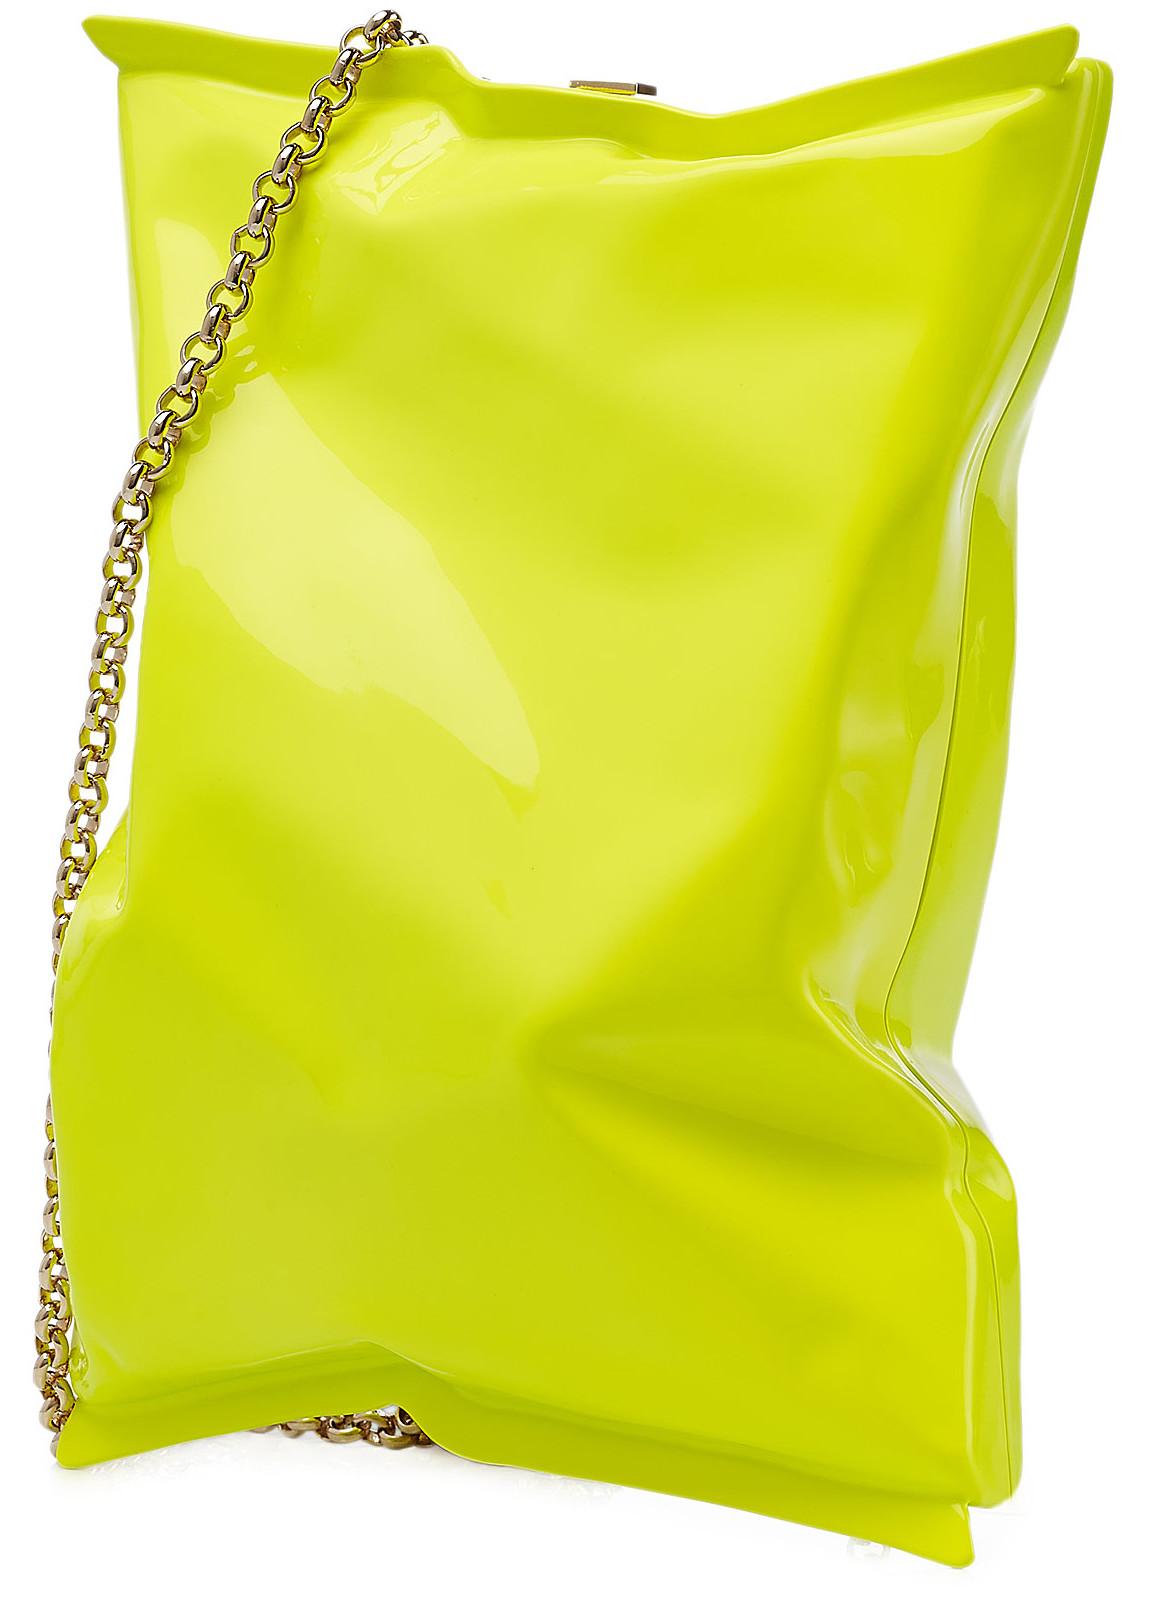 Anya Hindmarch crisp packet clutch neon green